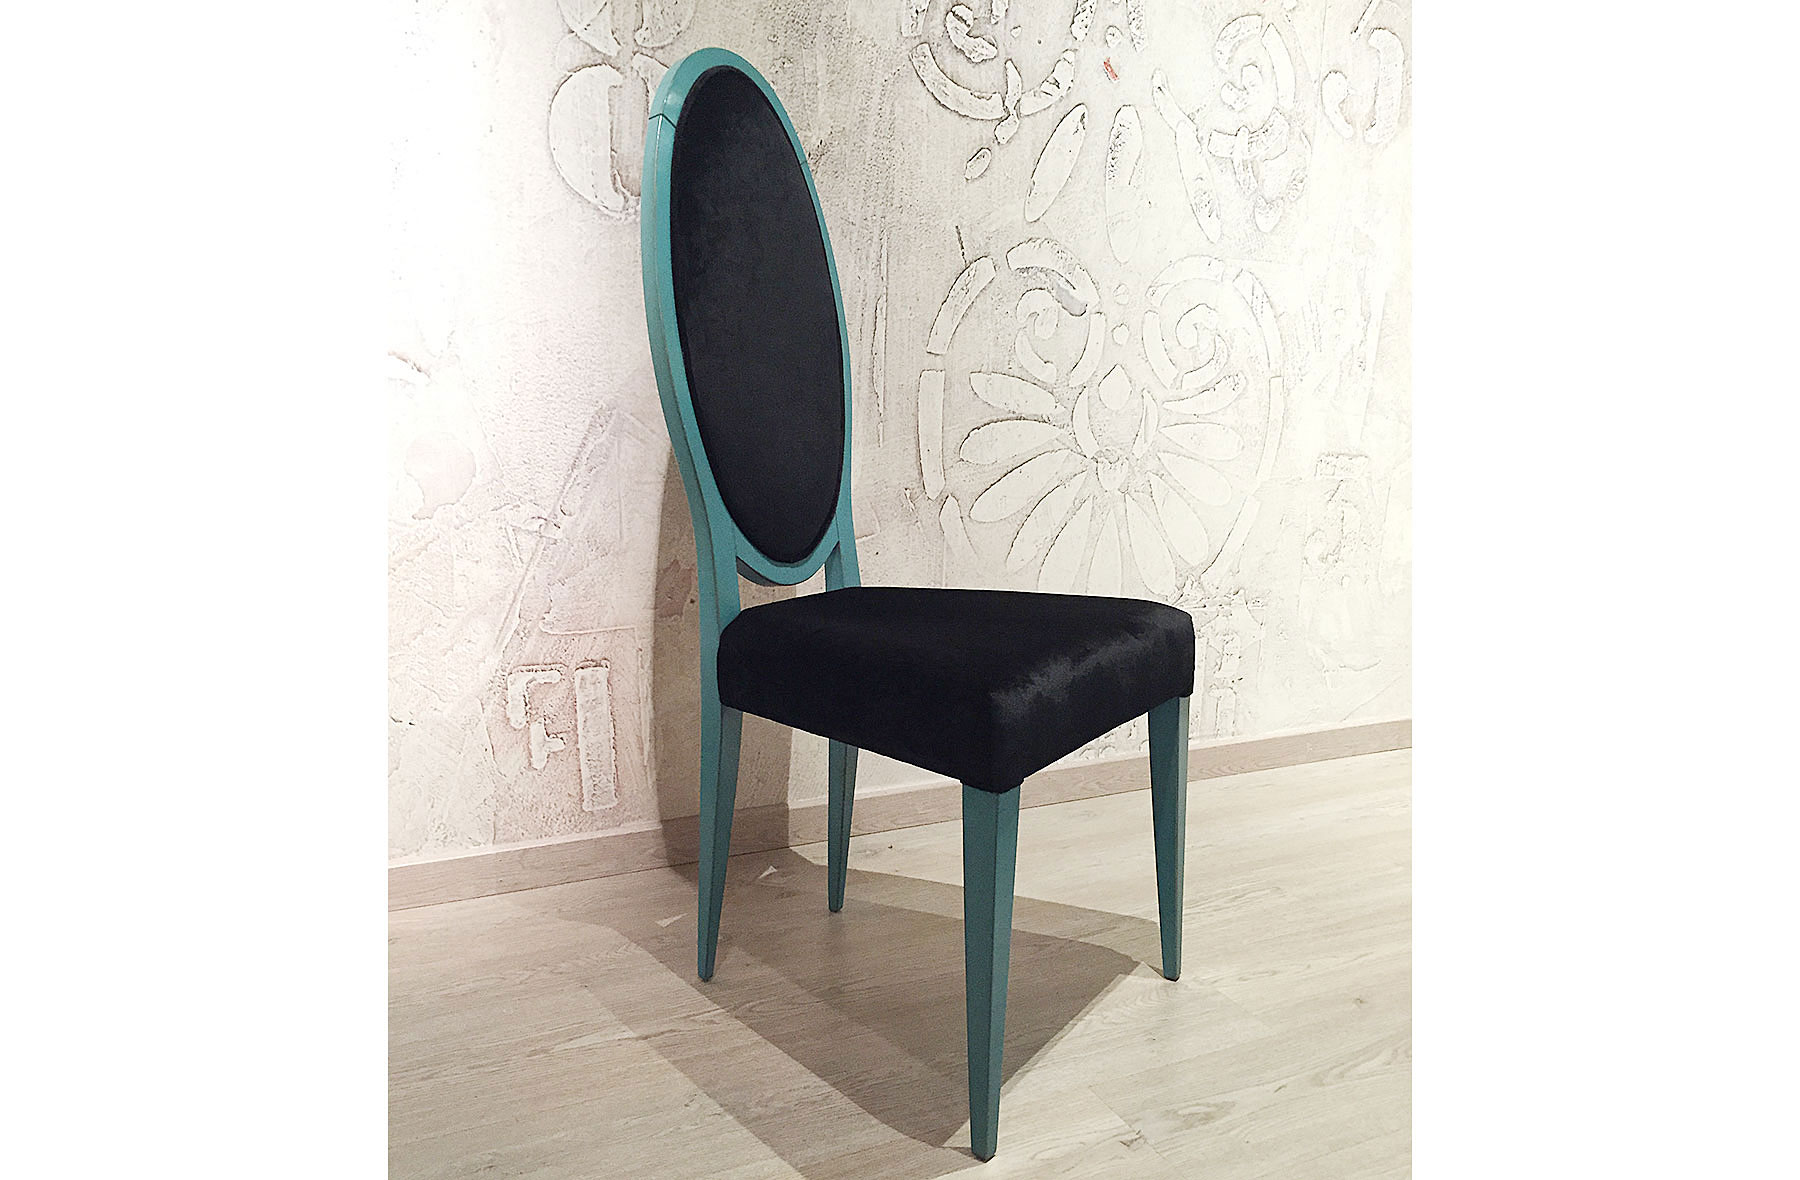 silla riviera turquesa terciopelo negro en